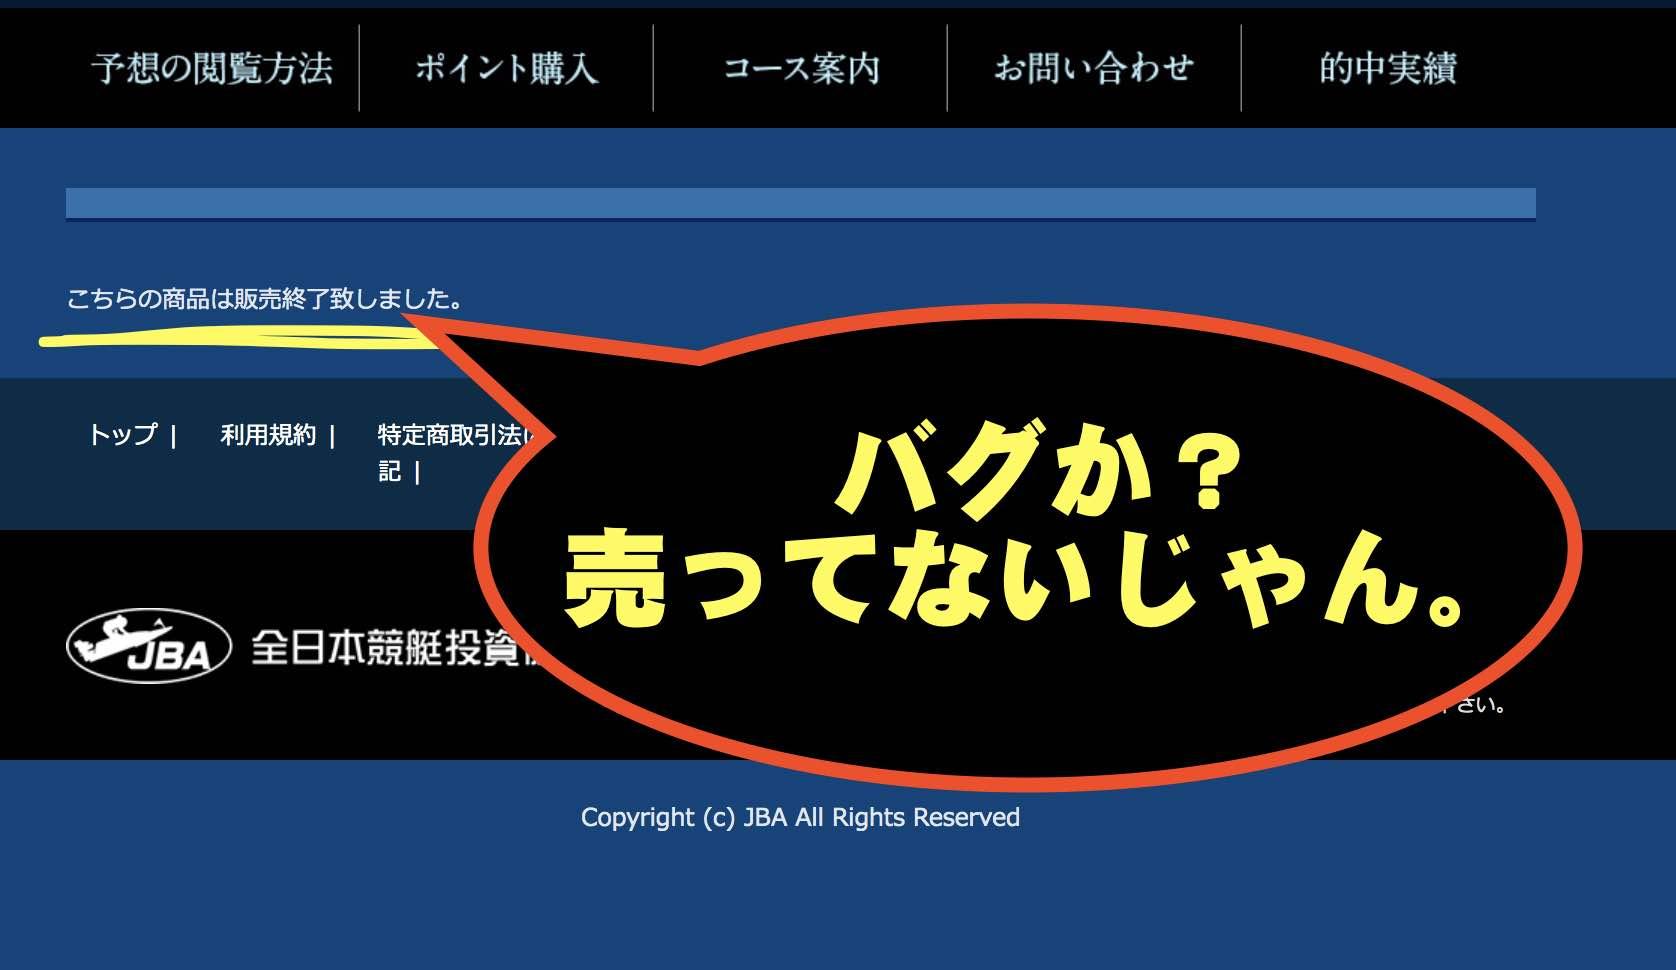 JBAという競艇予想サイトの予想、もう販売終了か?